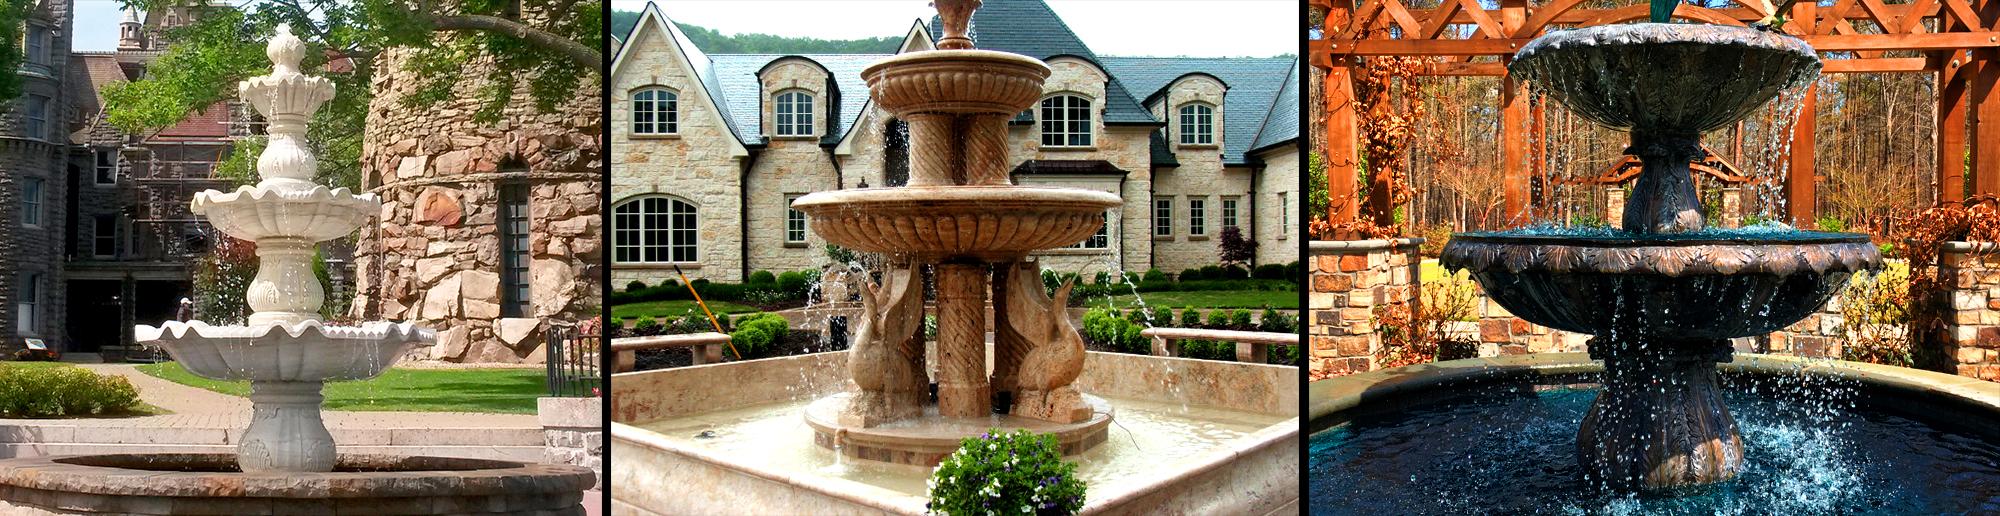 Custom-Fountain-Development-and-Design-Bronze-and-Marble-Metropolitan-Galleries-Inc.